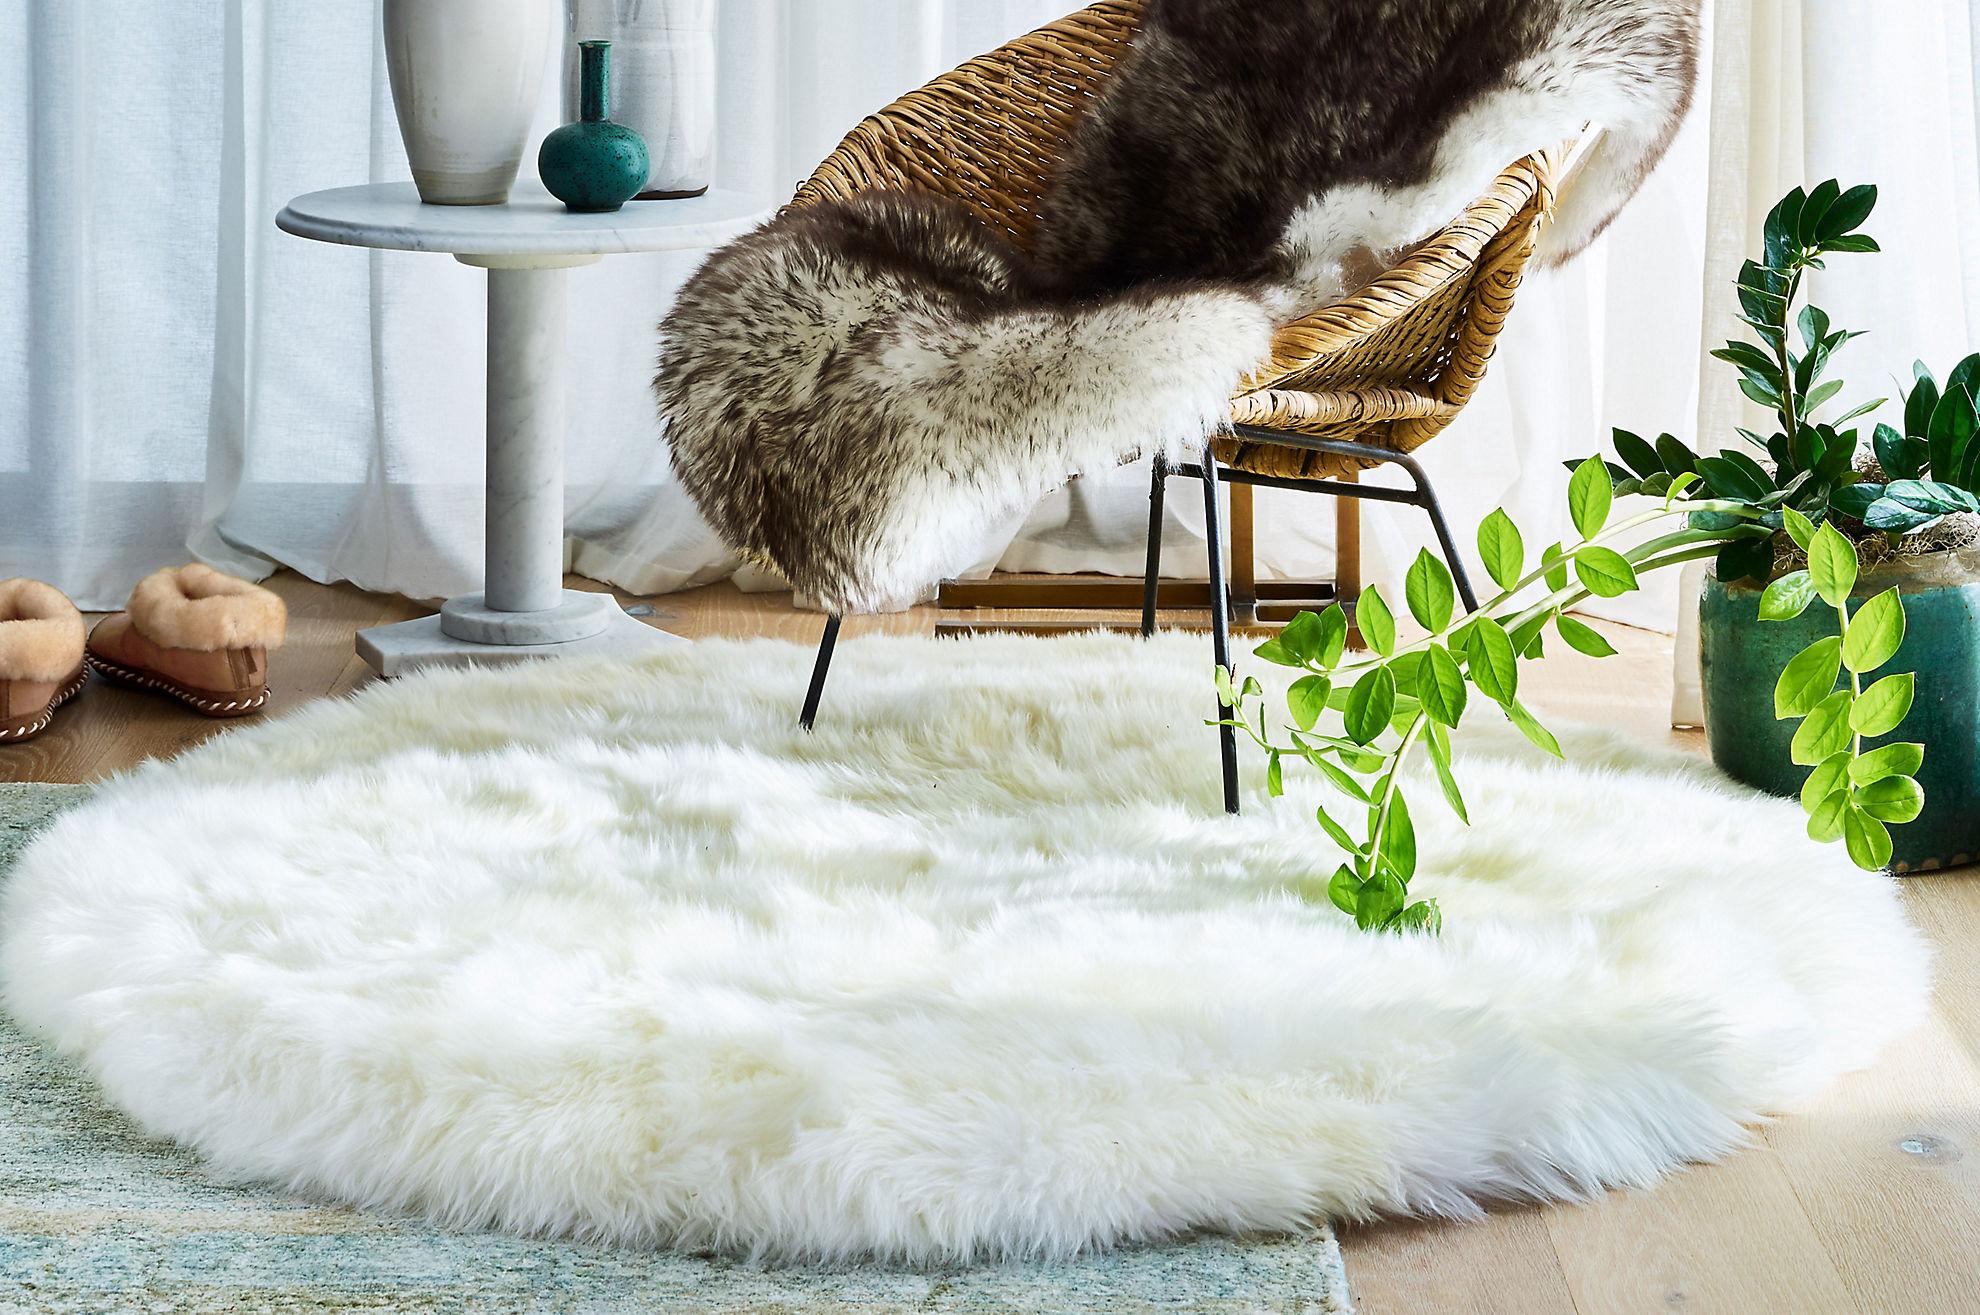 4' Round Premium Australian Sheepskin Area Rug